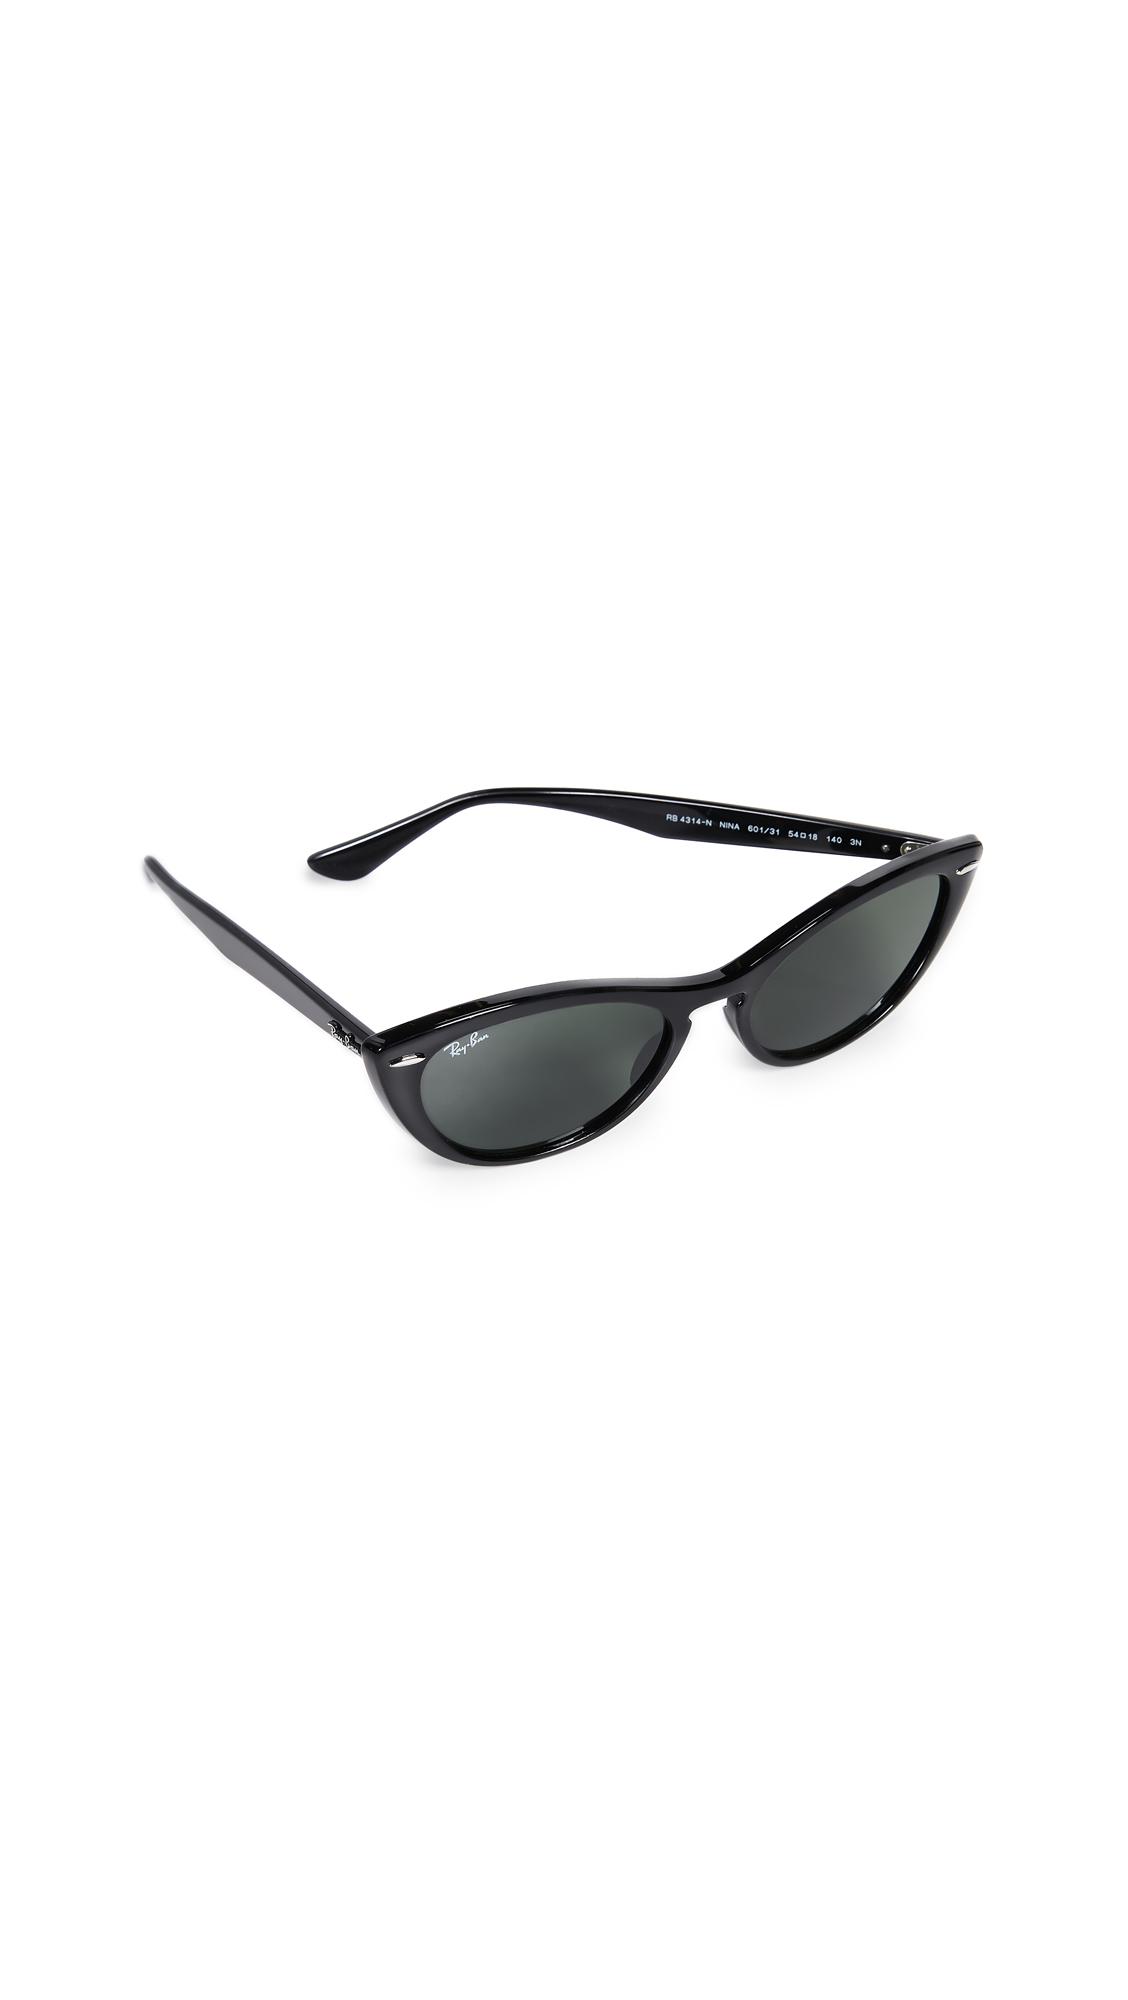 5869b23fb9 Ray Ban Rb4314N Nina Cat Eye Sunglasses In Black